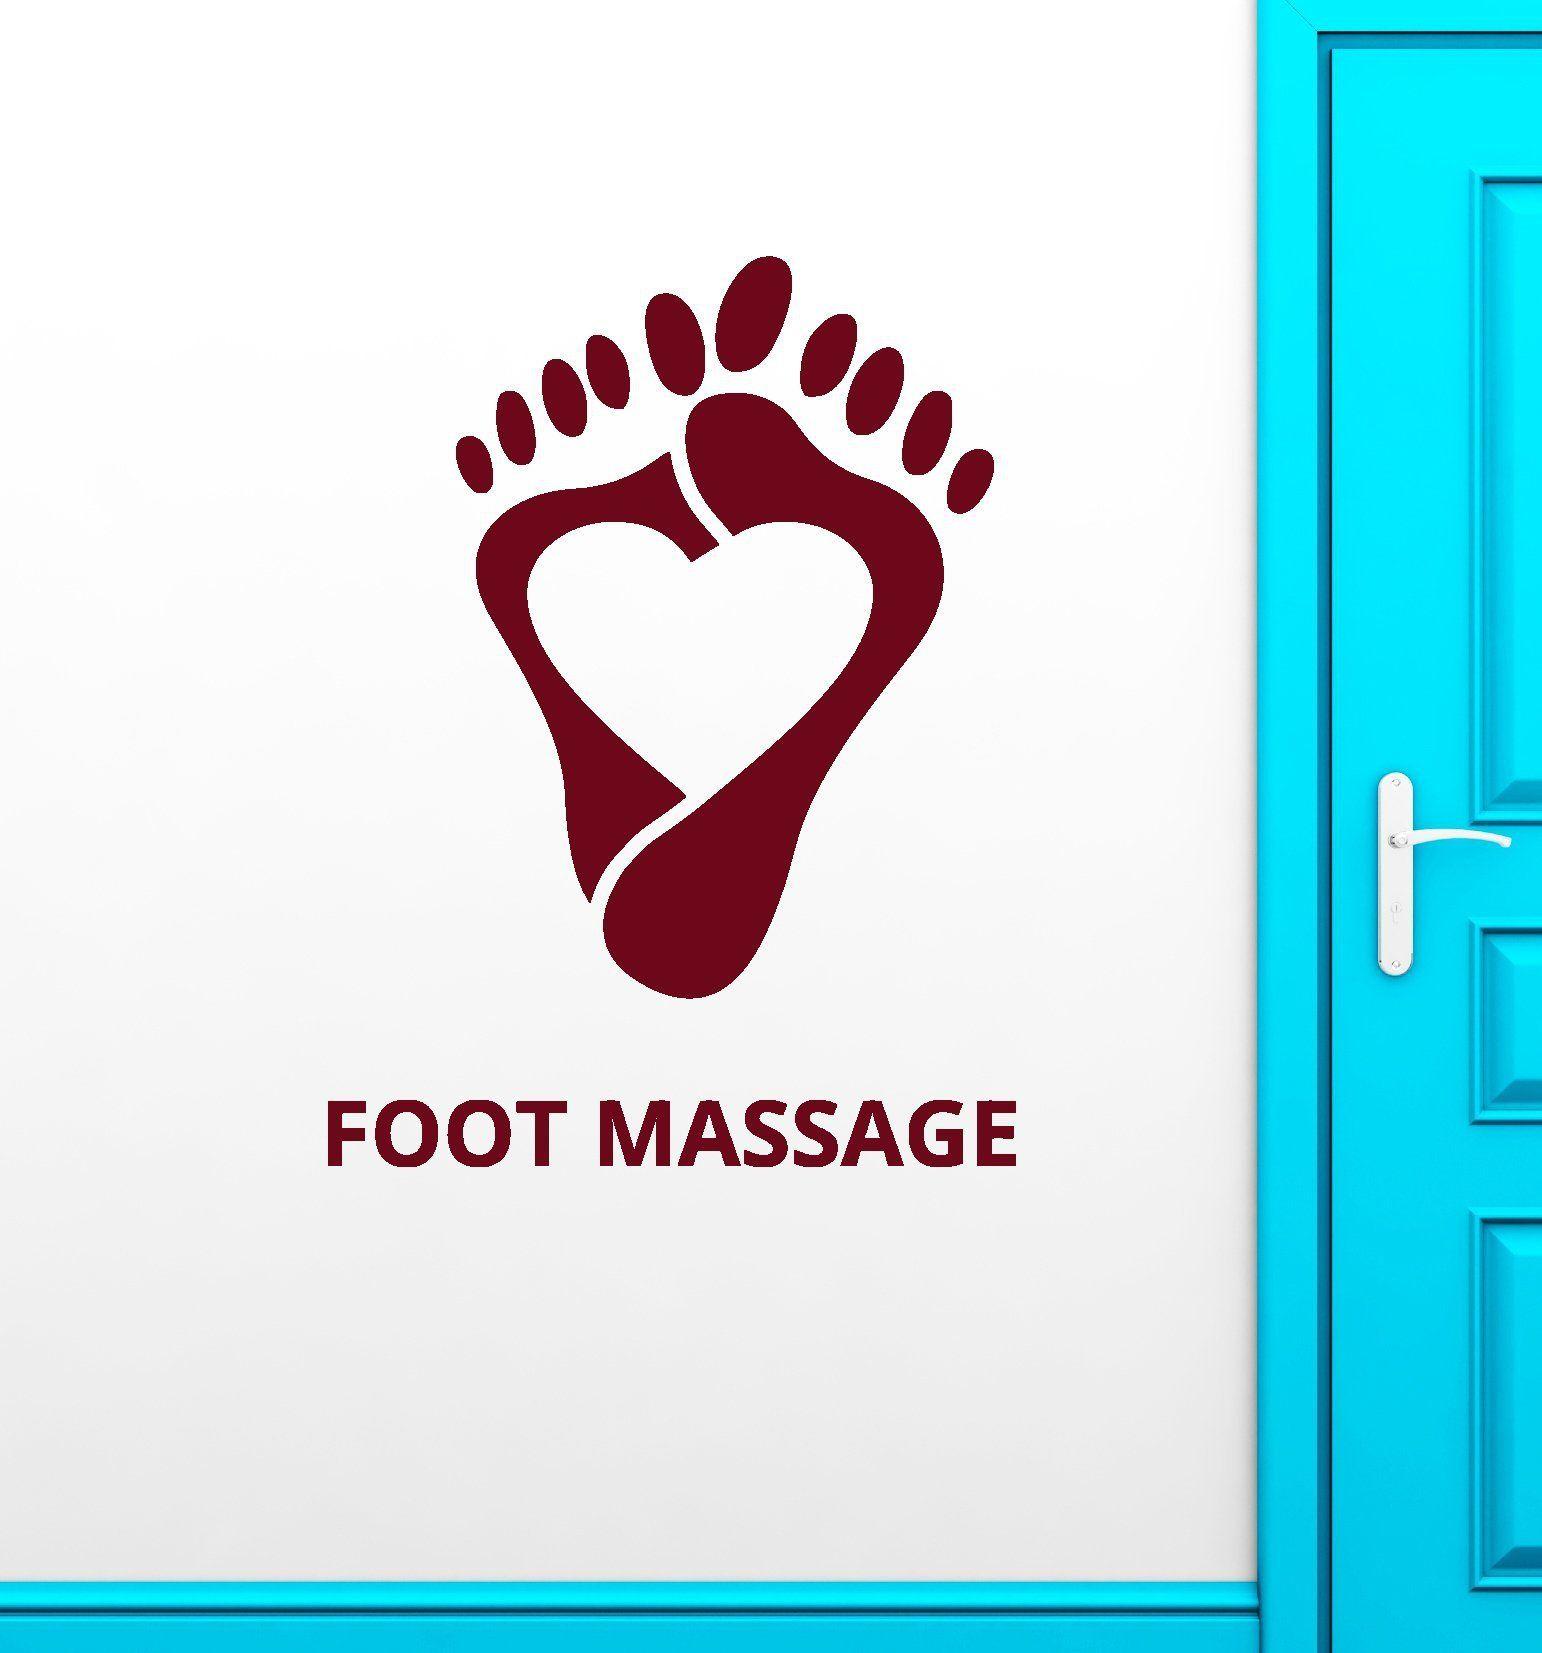 Vinyl Wall Decal Foot Massage Words Spa Center Logo Feet Heart Stickers 2152ig